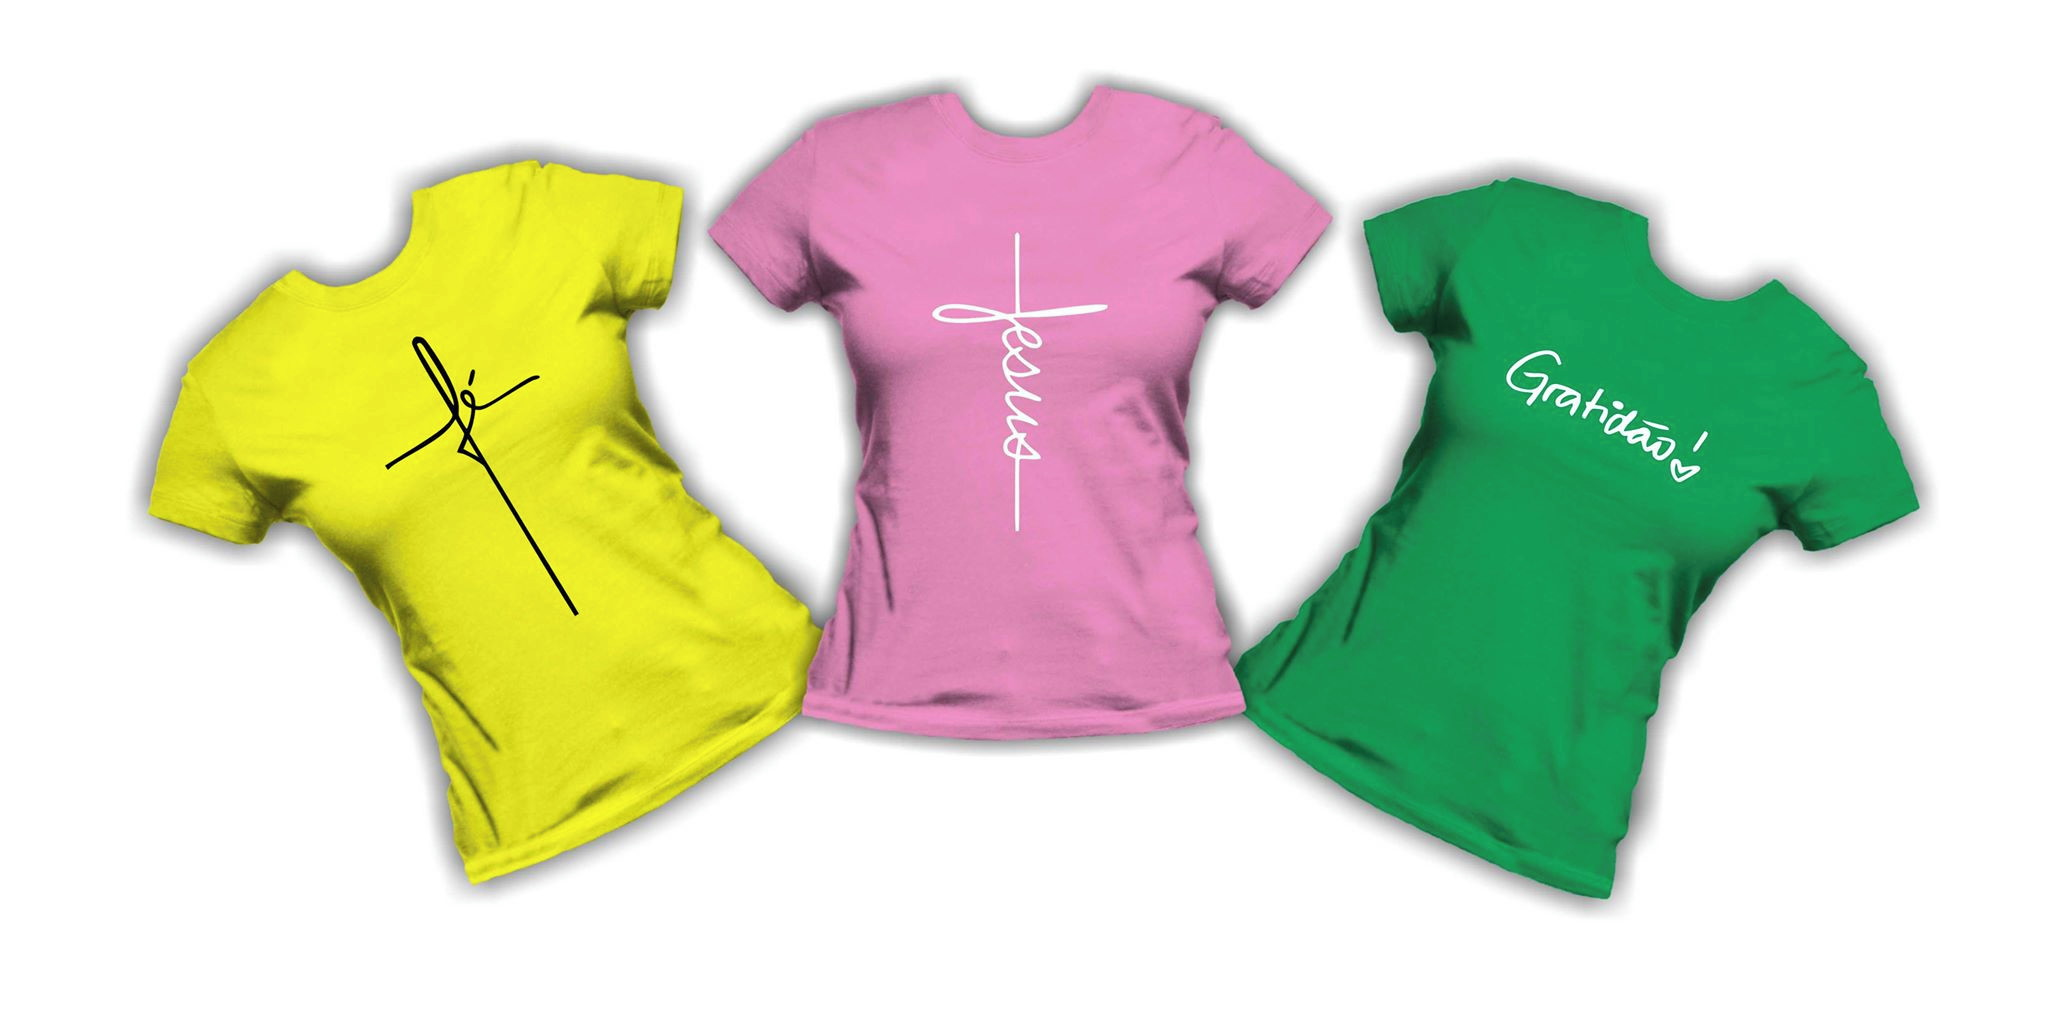 Camiseta Feminina Seja Grato Agradeca  e6b62db1e43d0